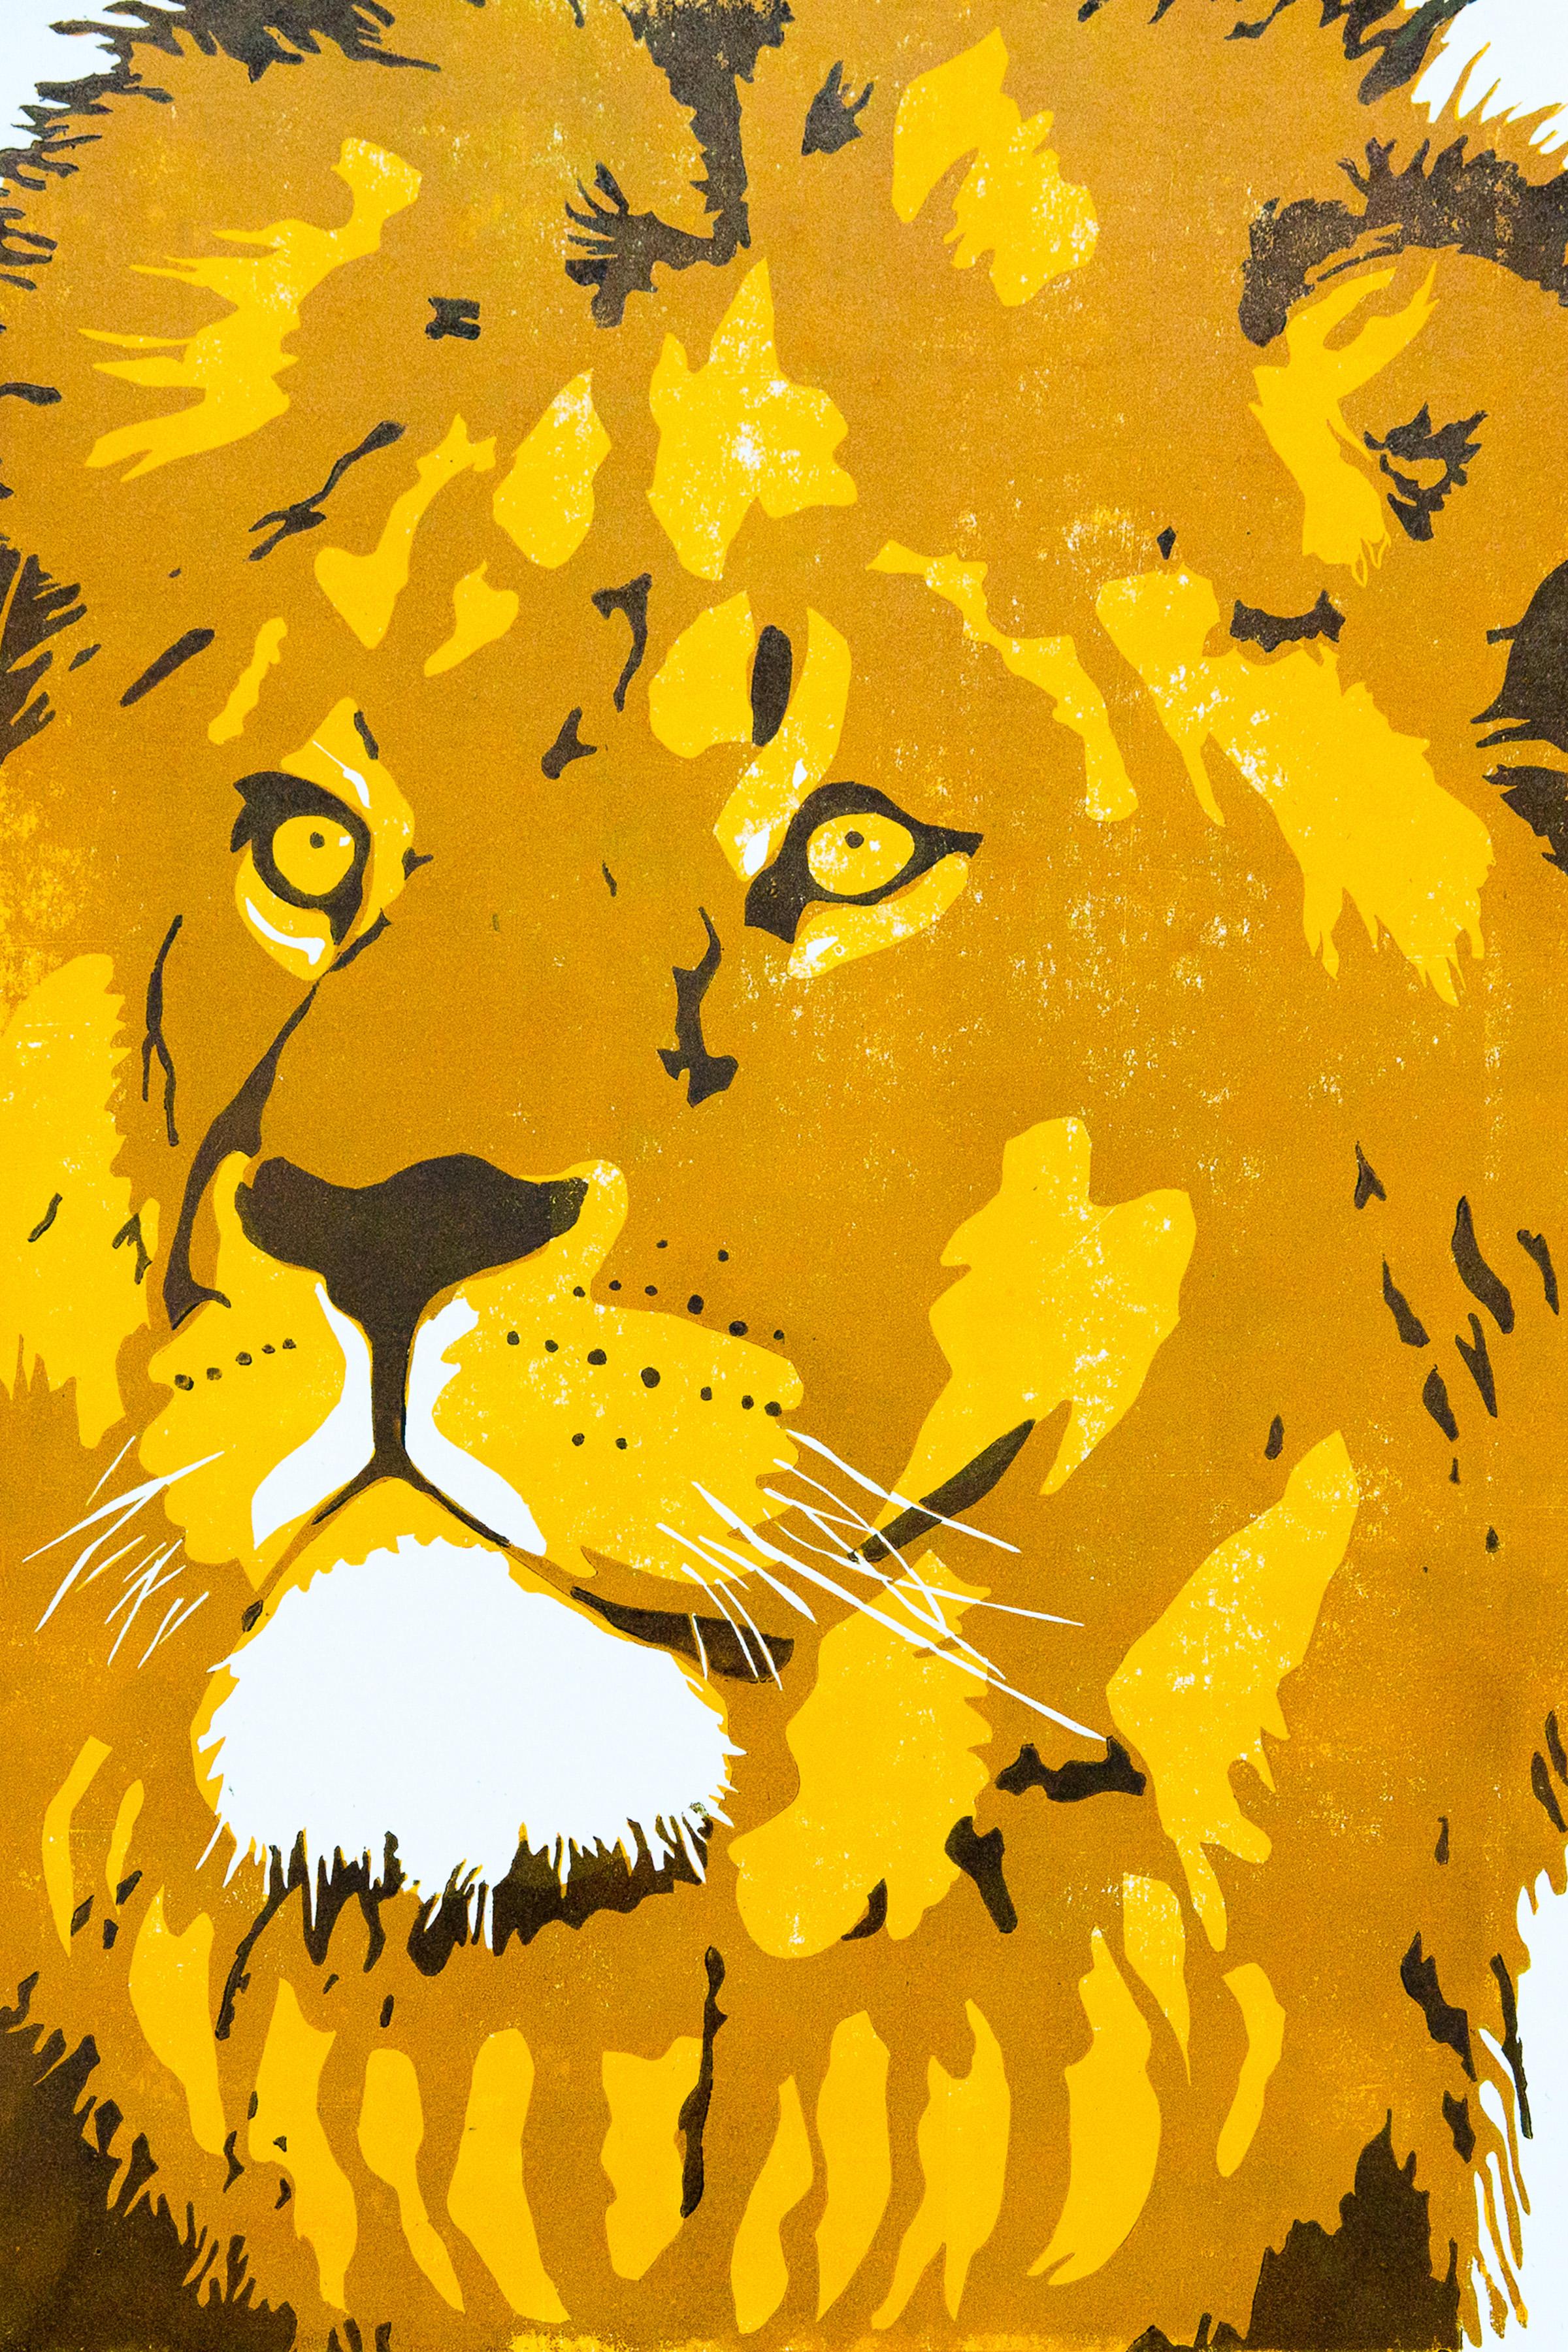 lion_letterpress_print_illustration.jpg